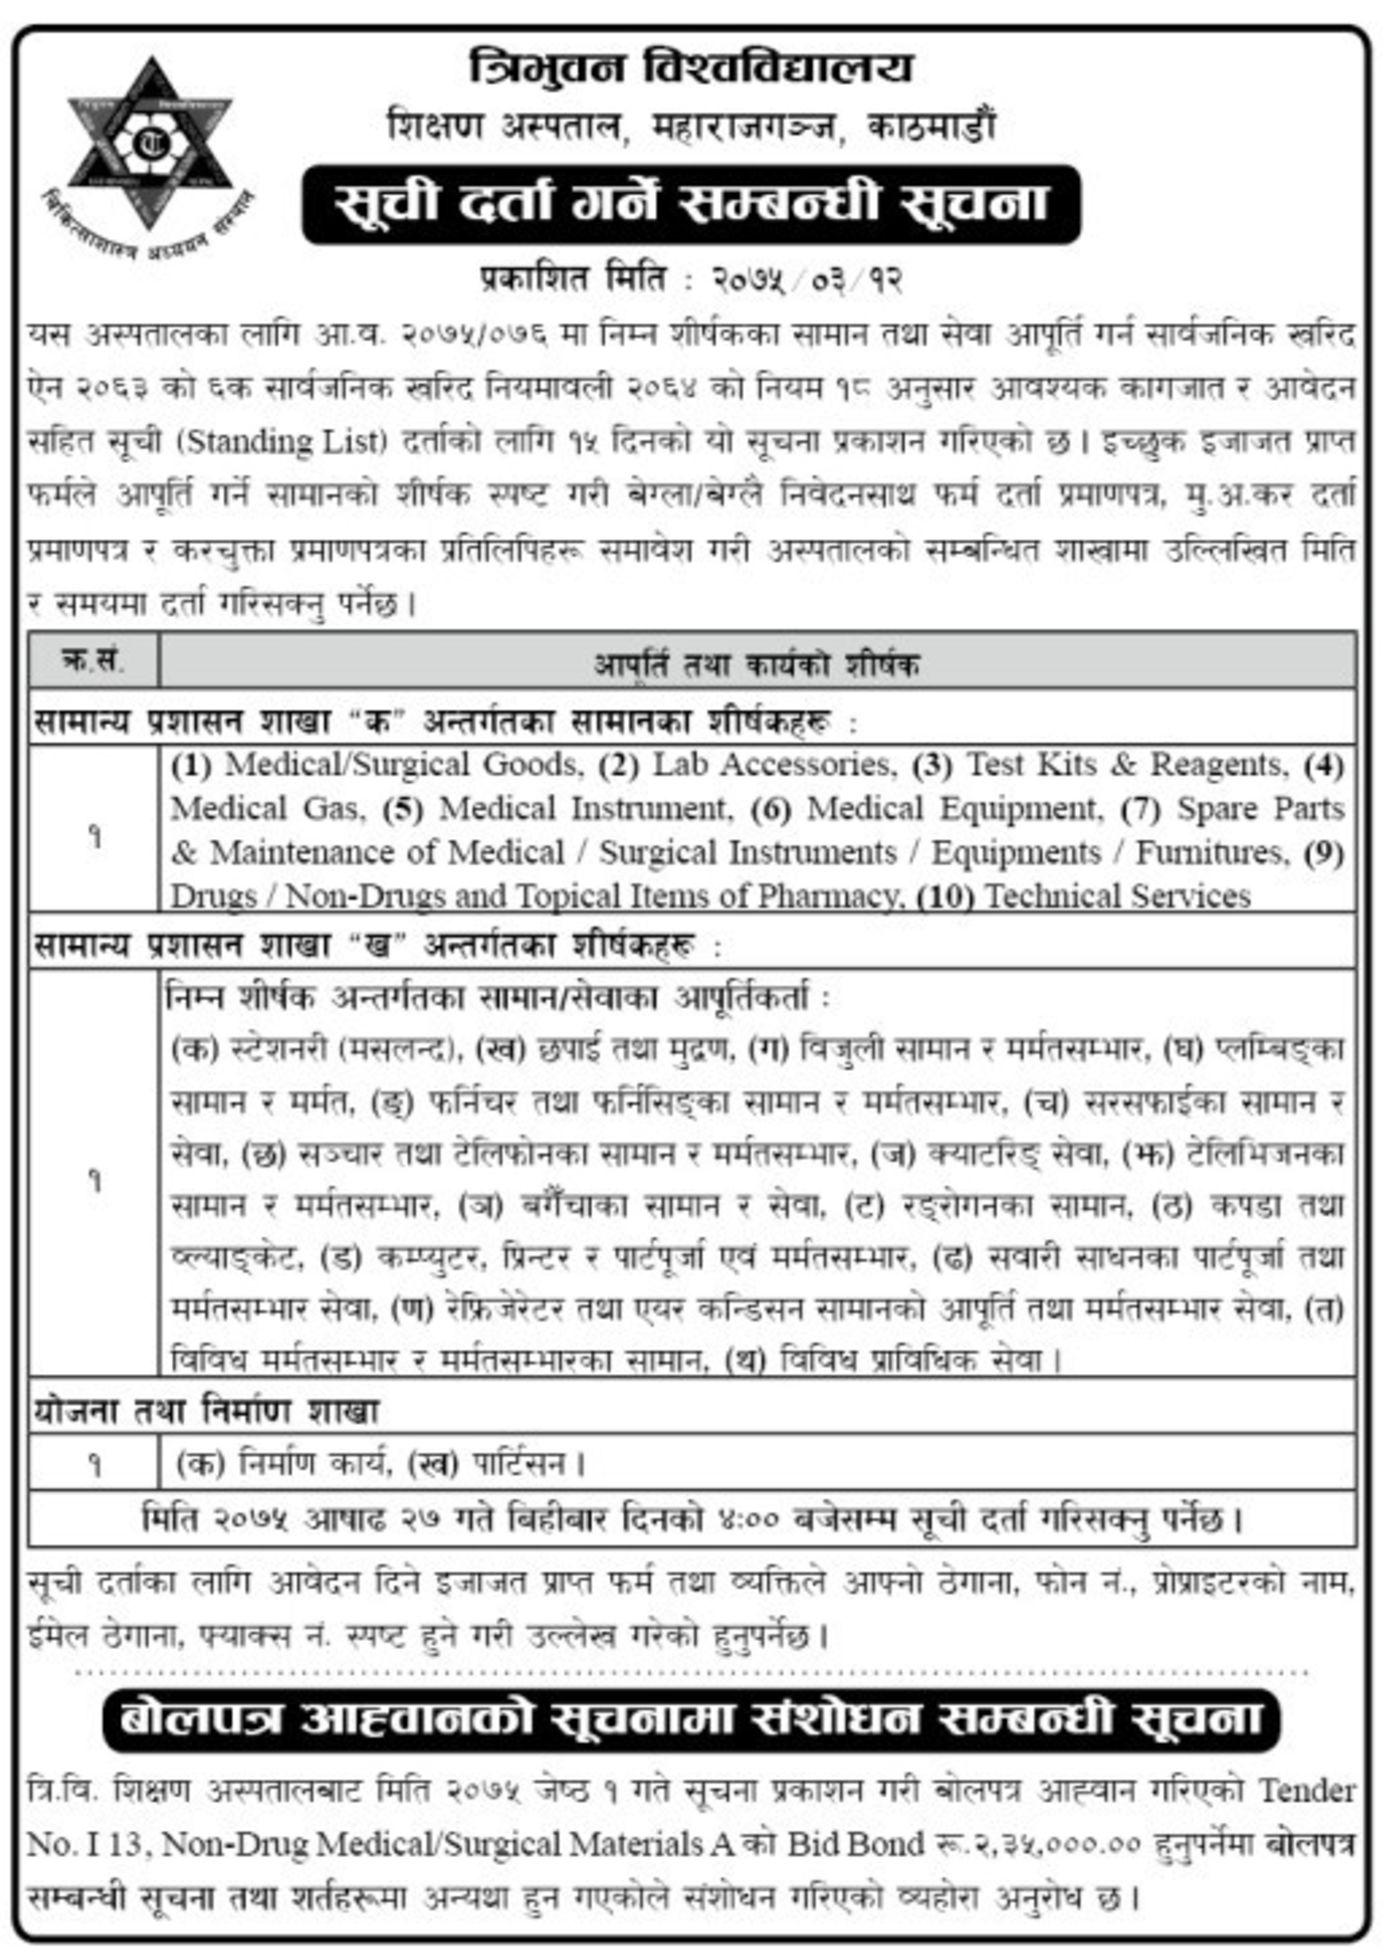 Bids And Tenders Nepal Preferred Vendor List Fiscal Year 2075